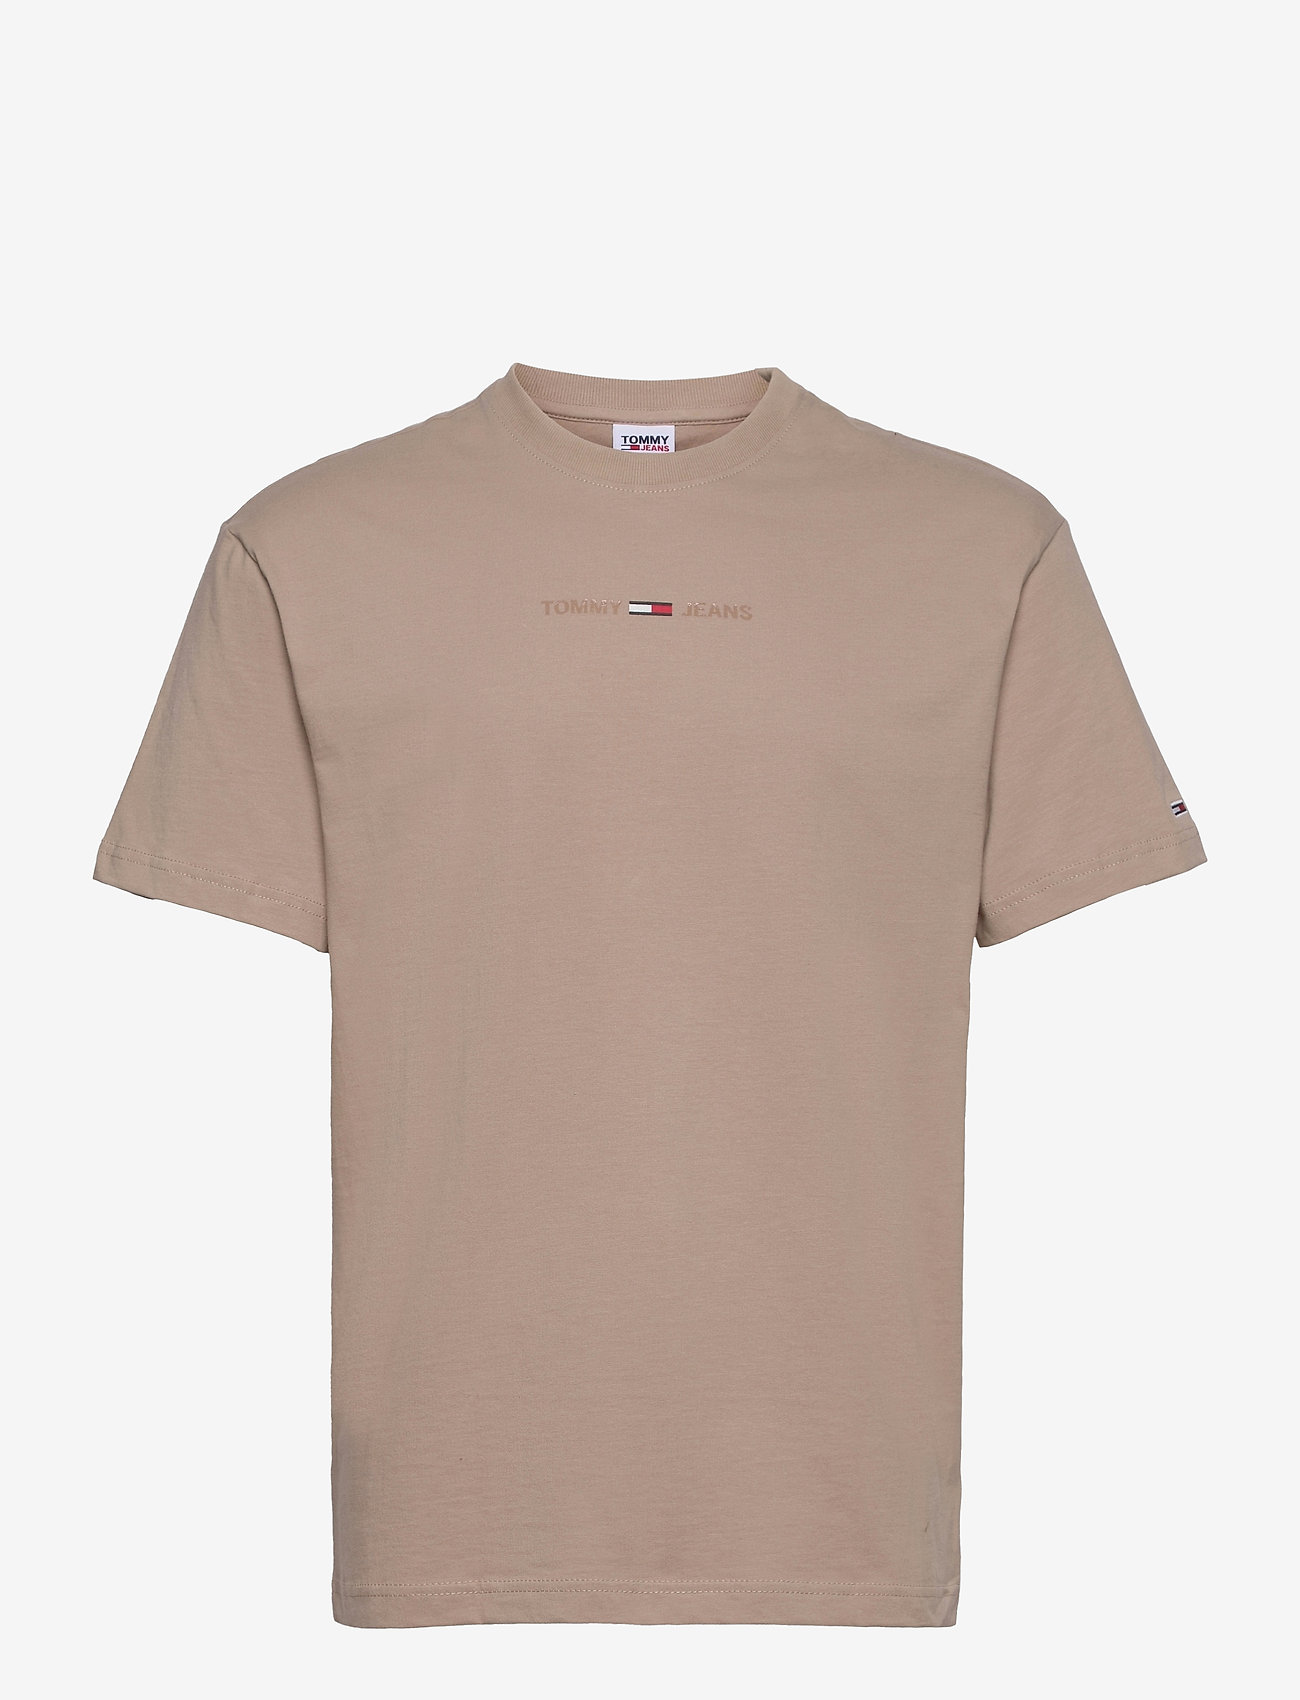 Tommy Jeans - TJM GEL LINEAR LOGO TEE - basic t-shirts - soft beige - 0